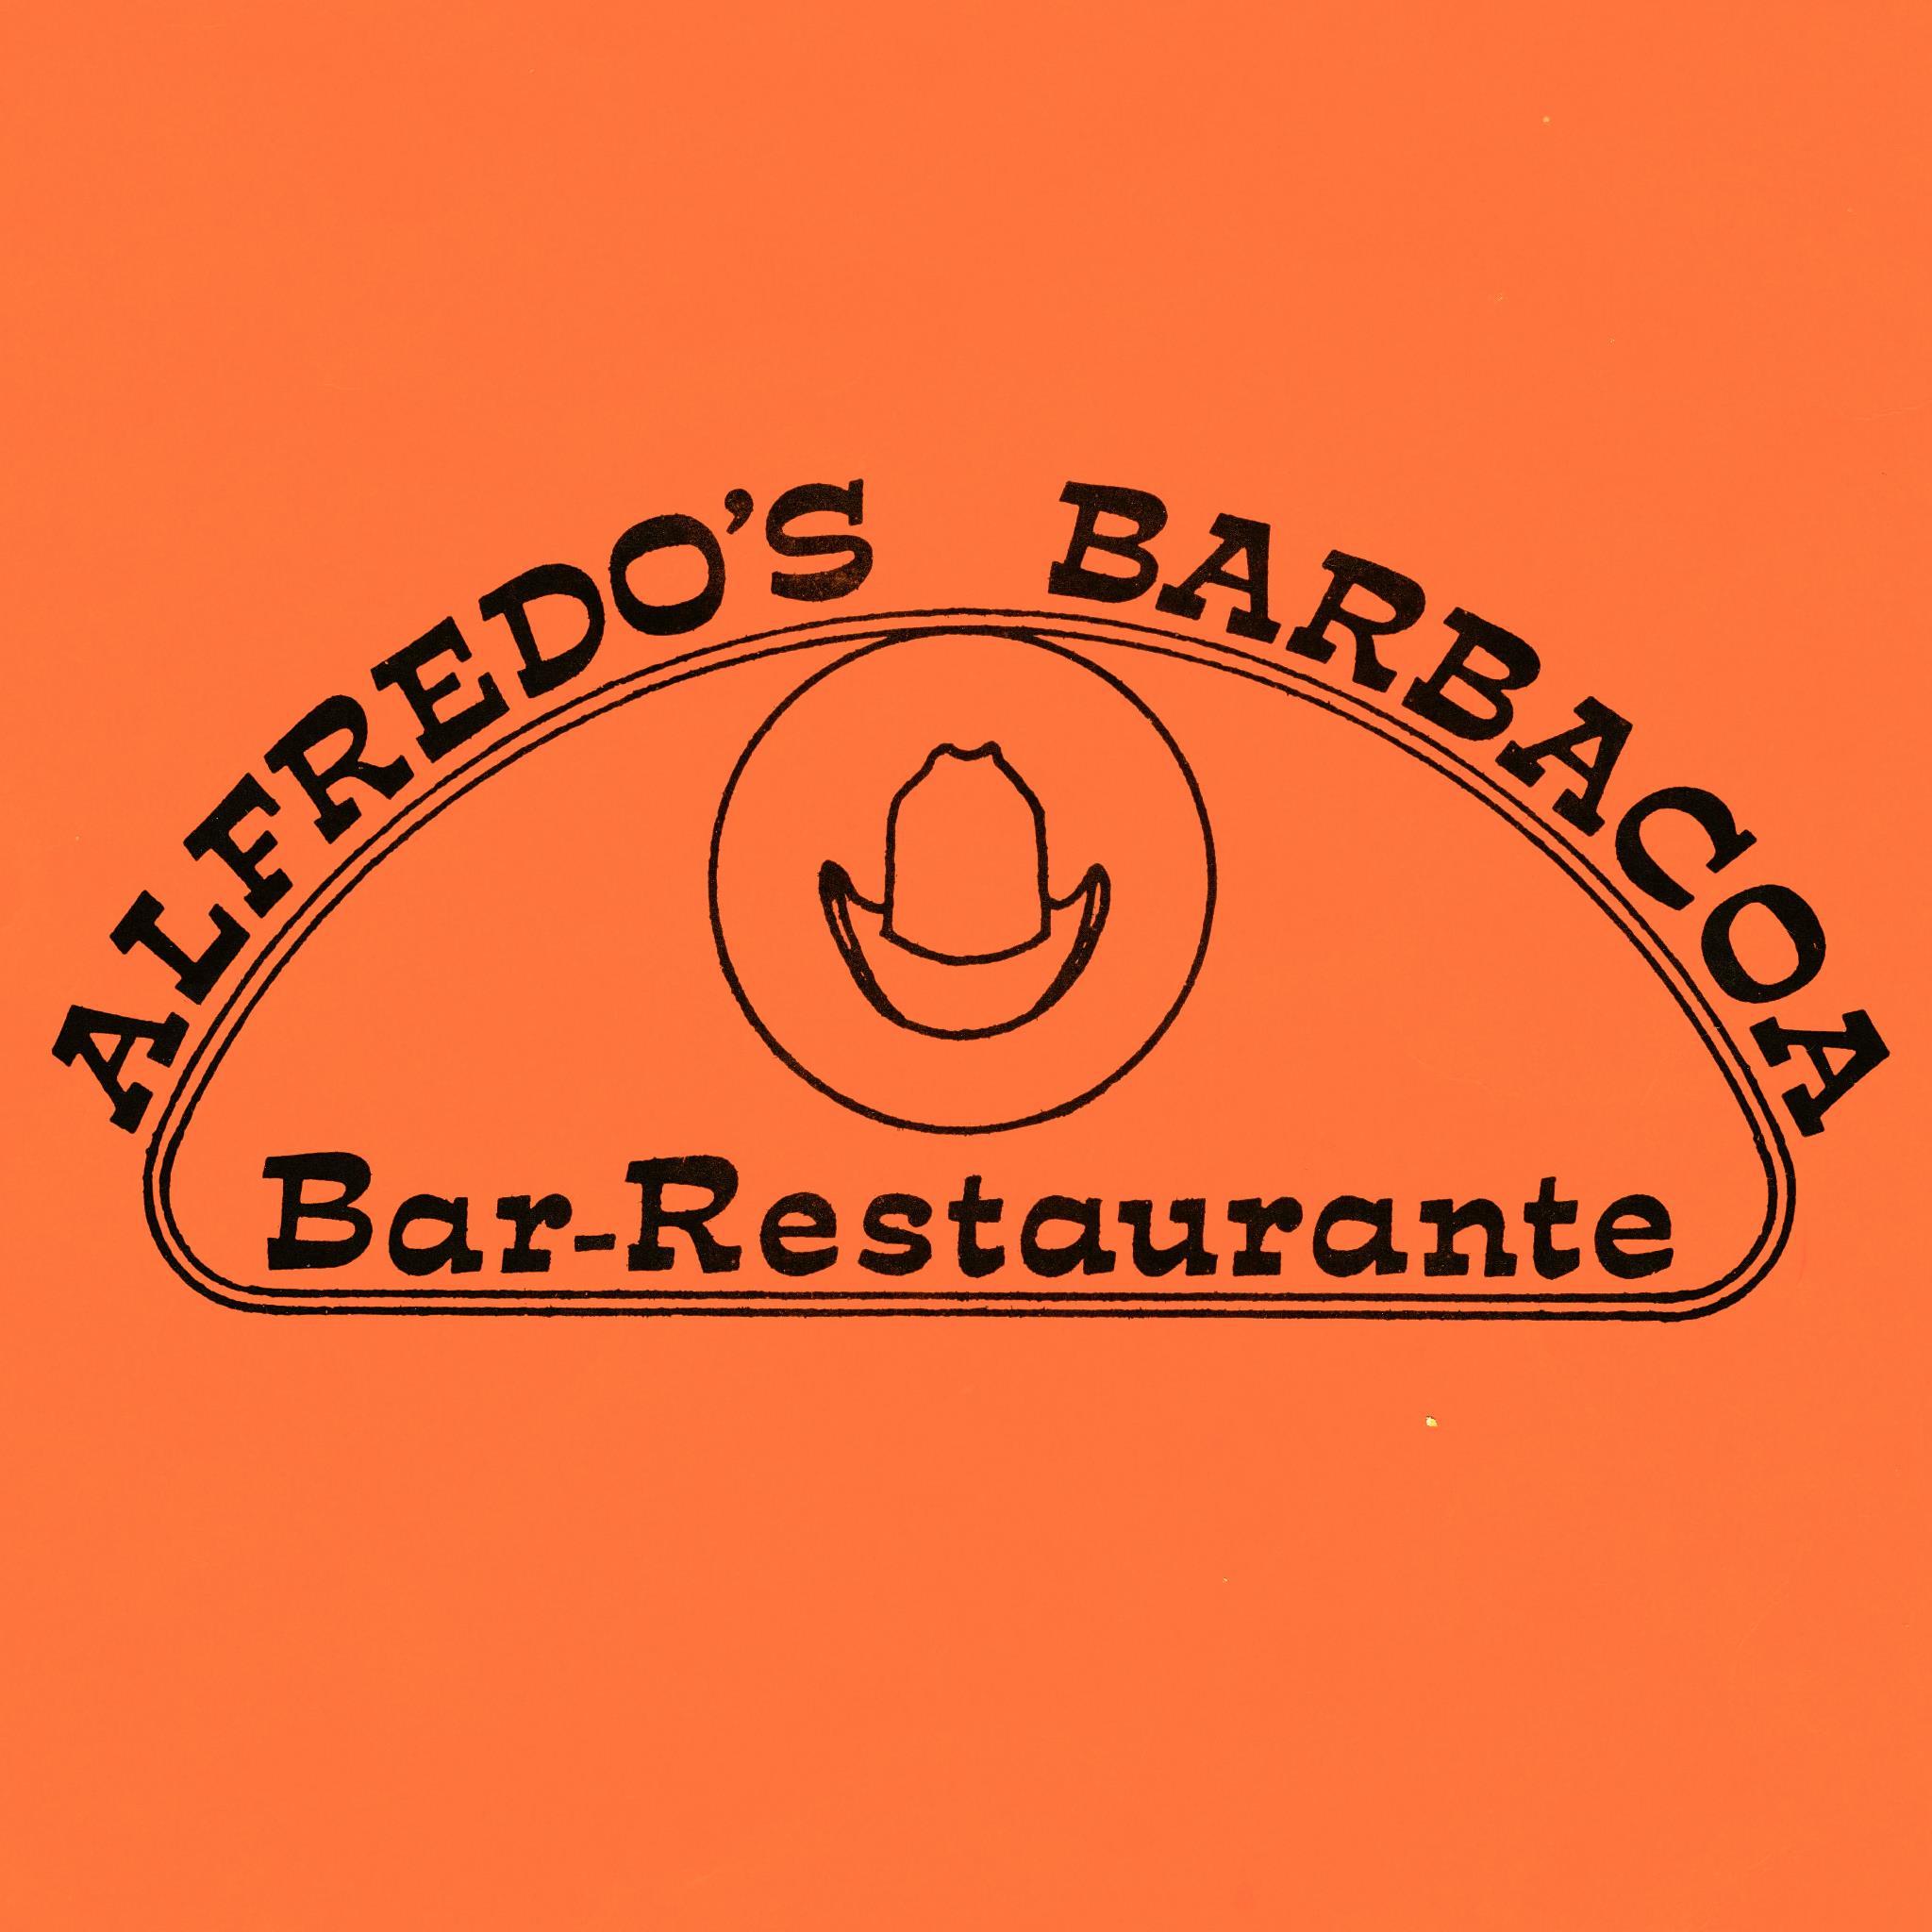 Alfredo's Barbacoa (Juan Hurtado de Mendoza)